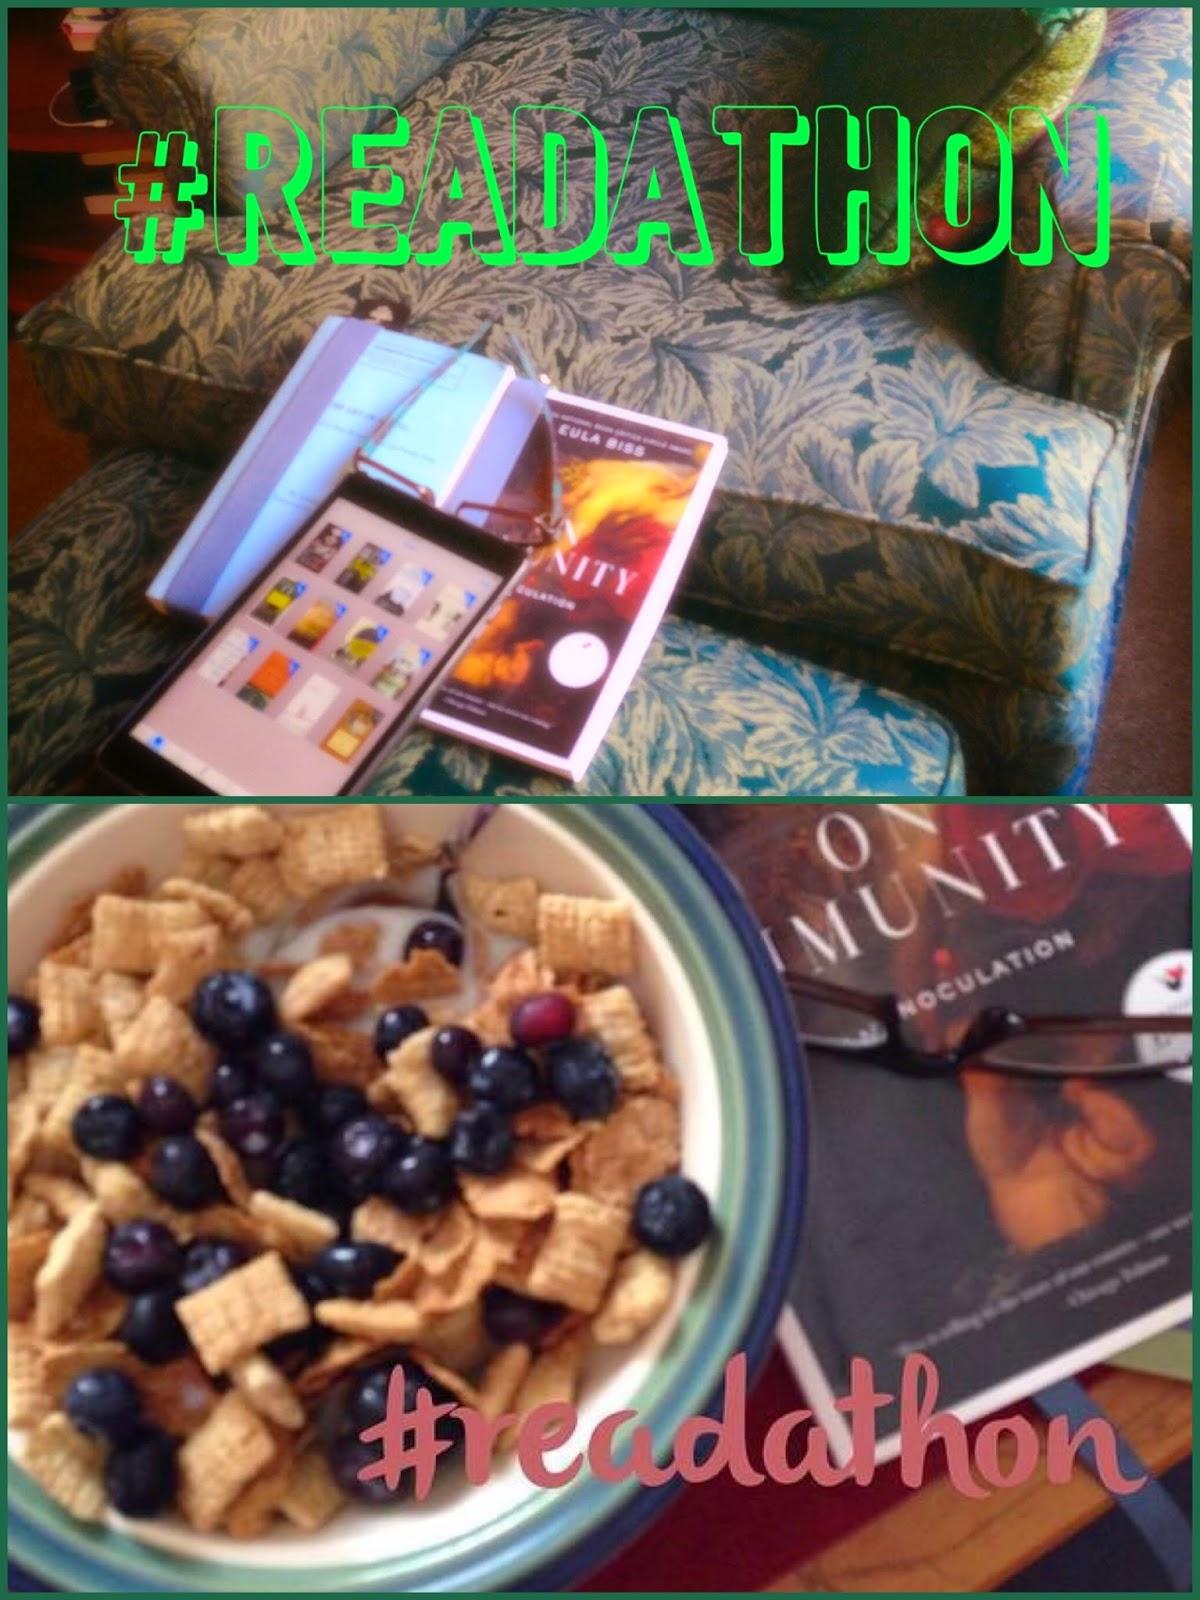 Fall Readathon photo collage The 3 Rs Blog